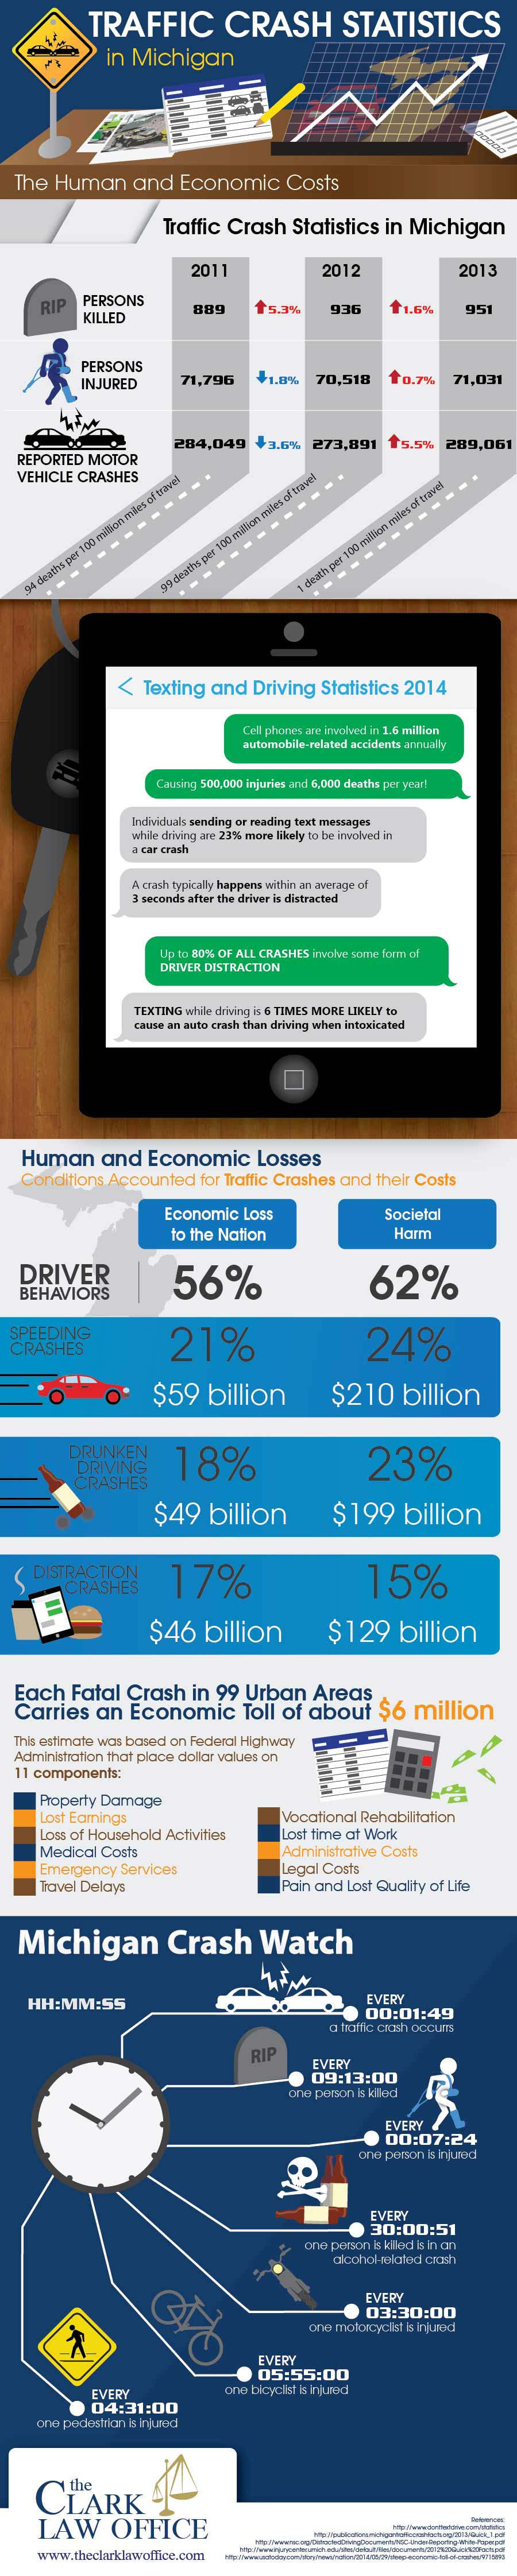 Traffic-Crash-Statistics-In